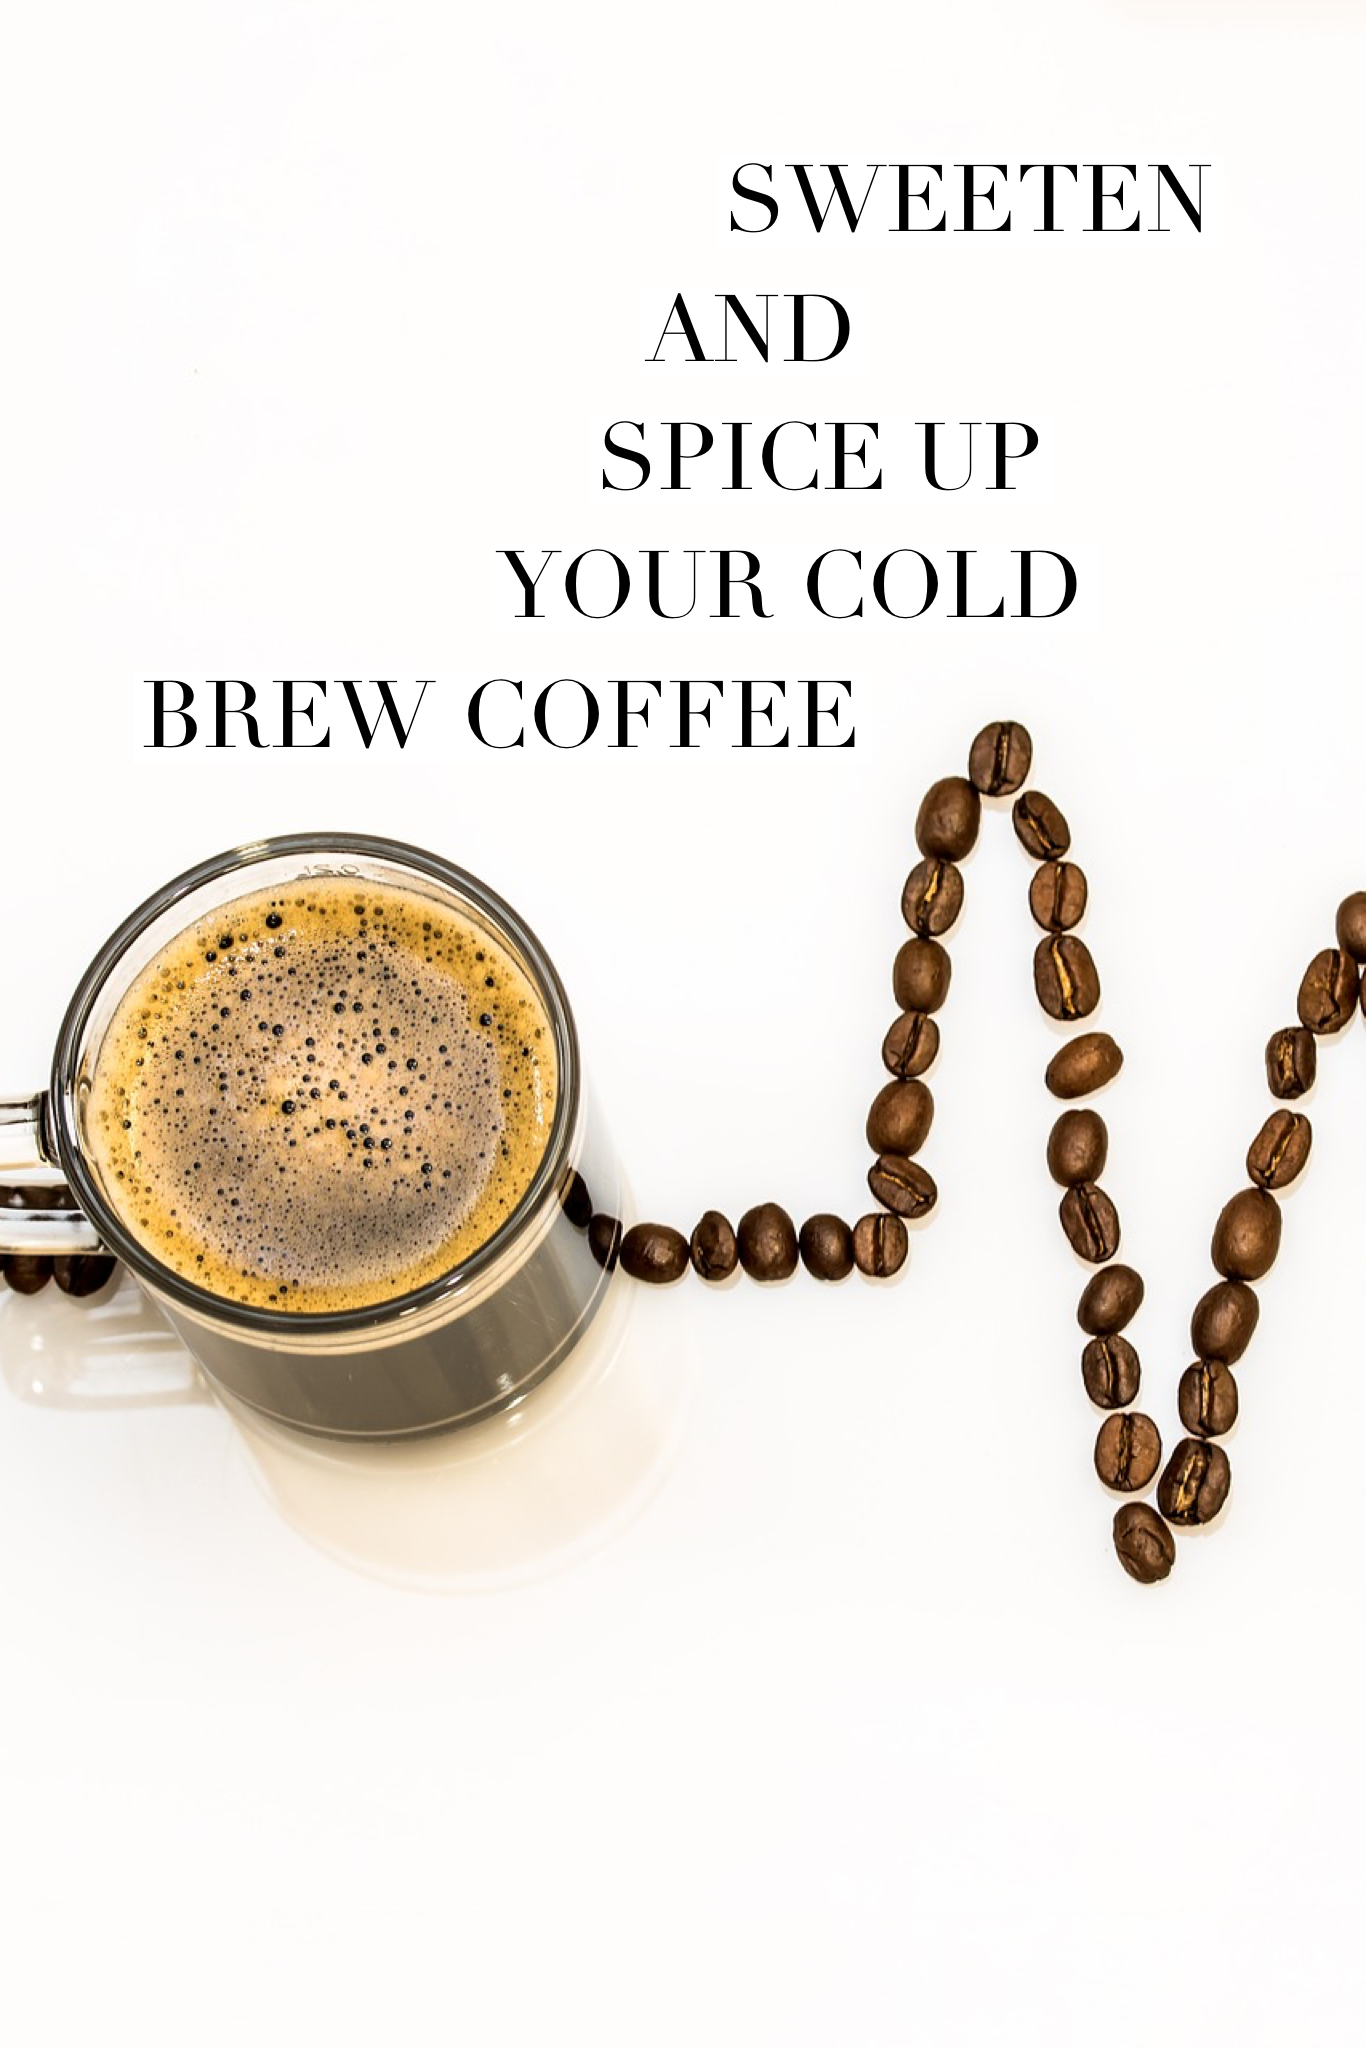 healthy ways to sweeten coffee